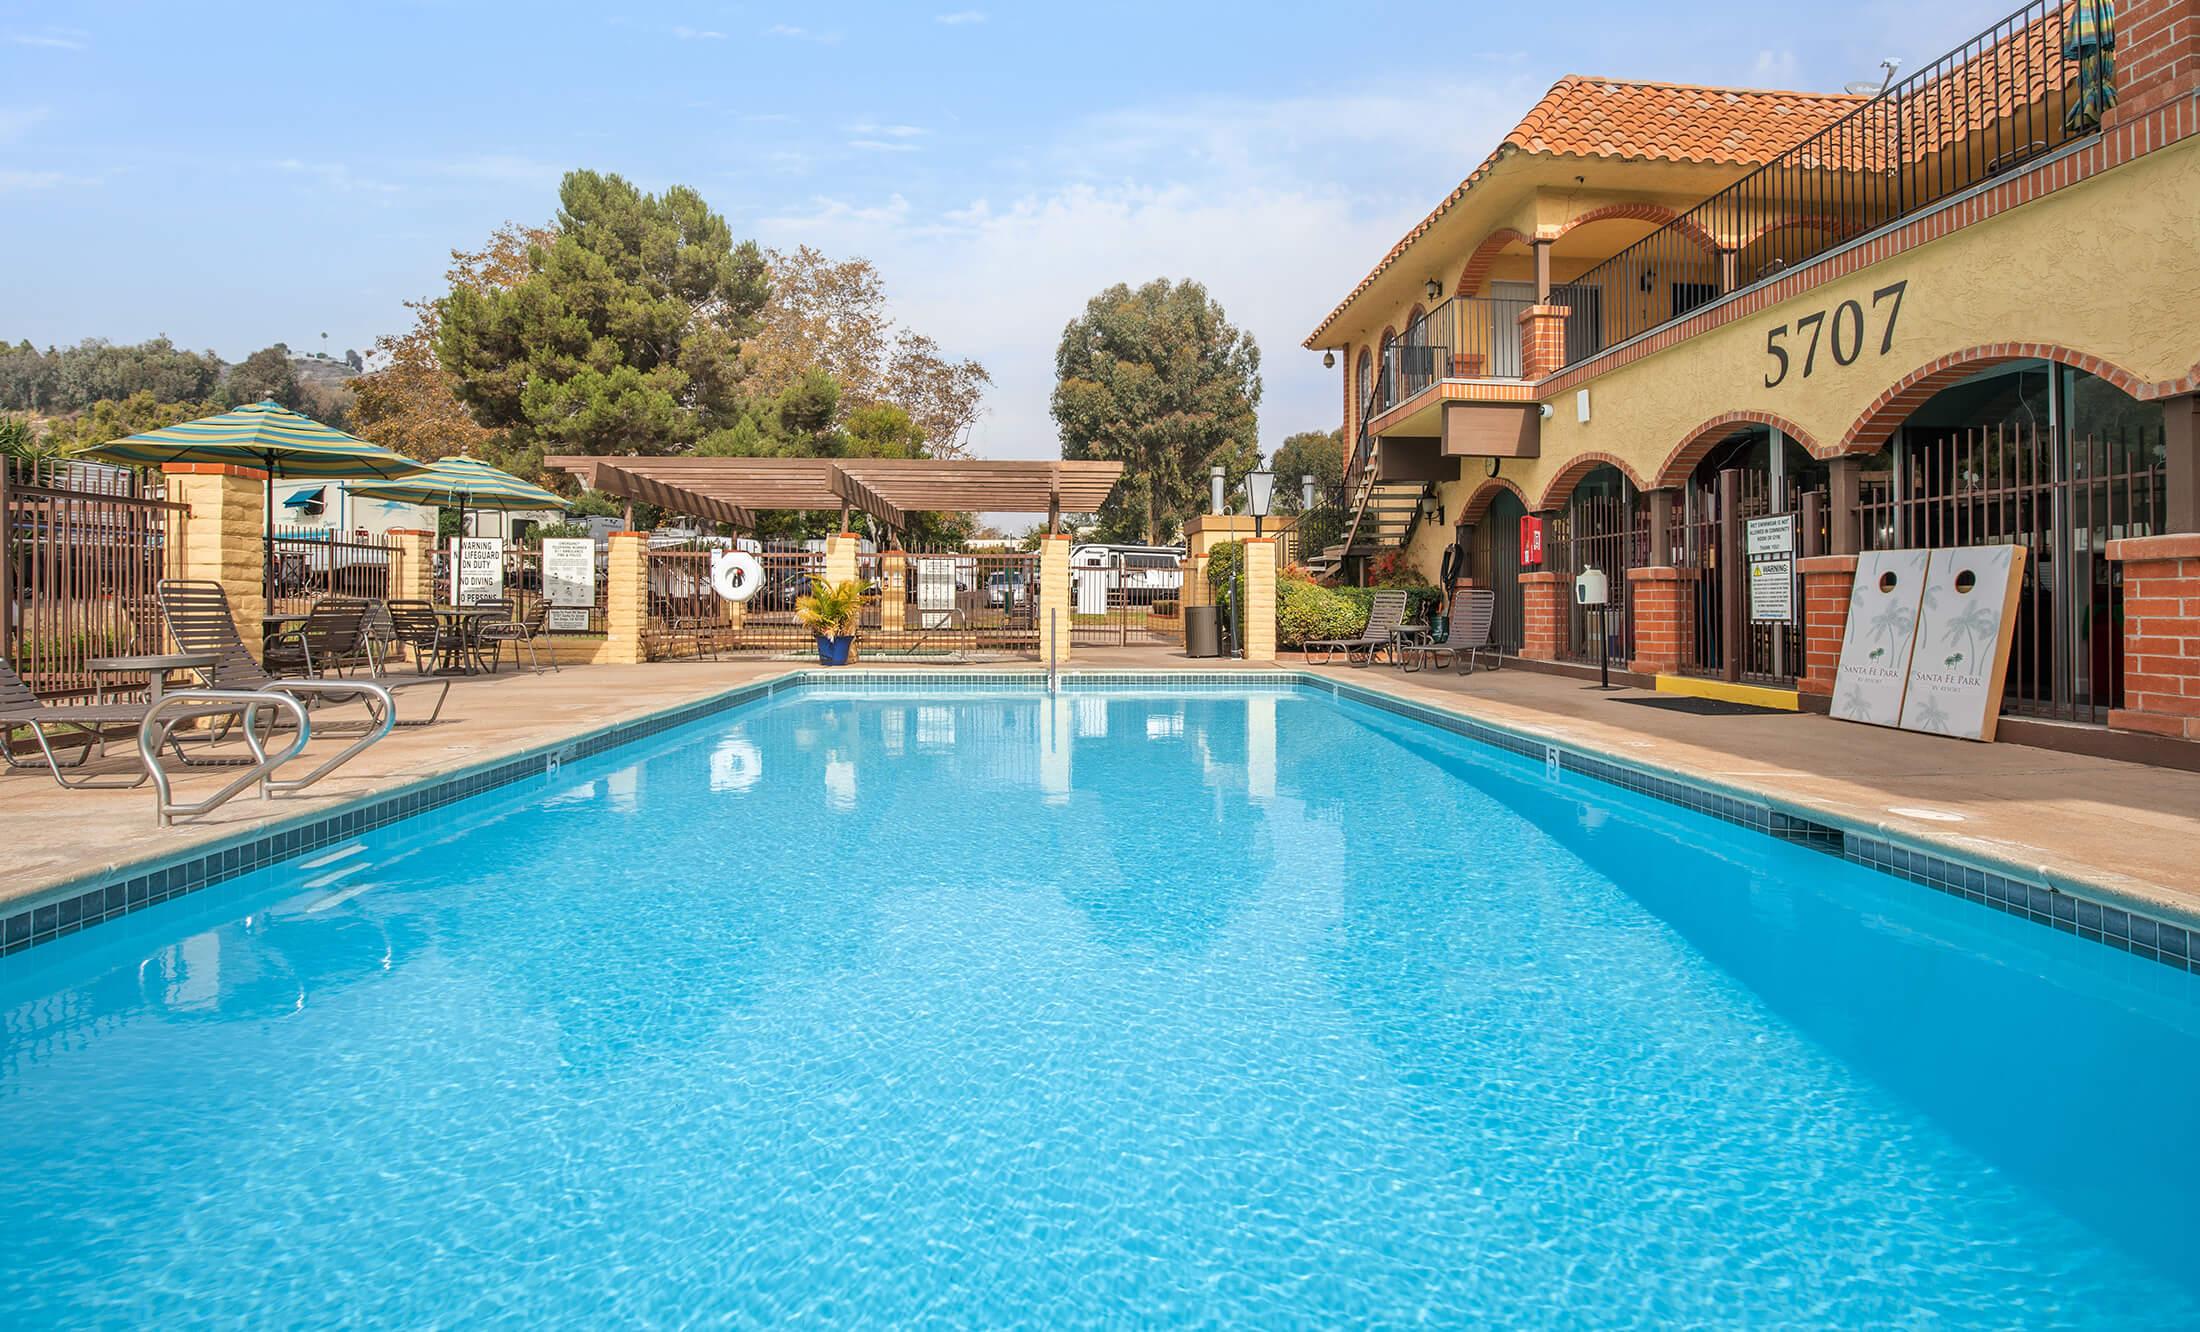 Santa Fe Park RV Resort - Apartments in San Diego, CA